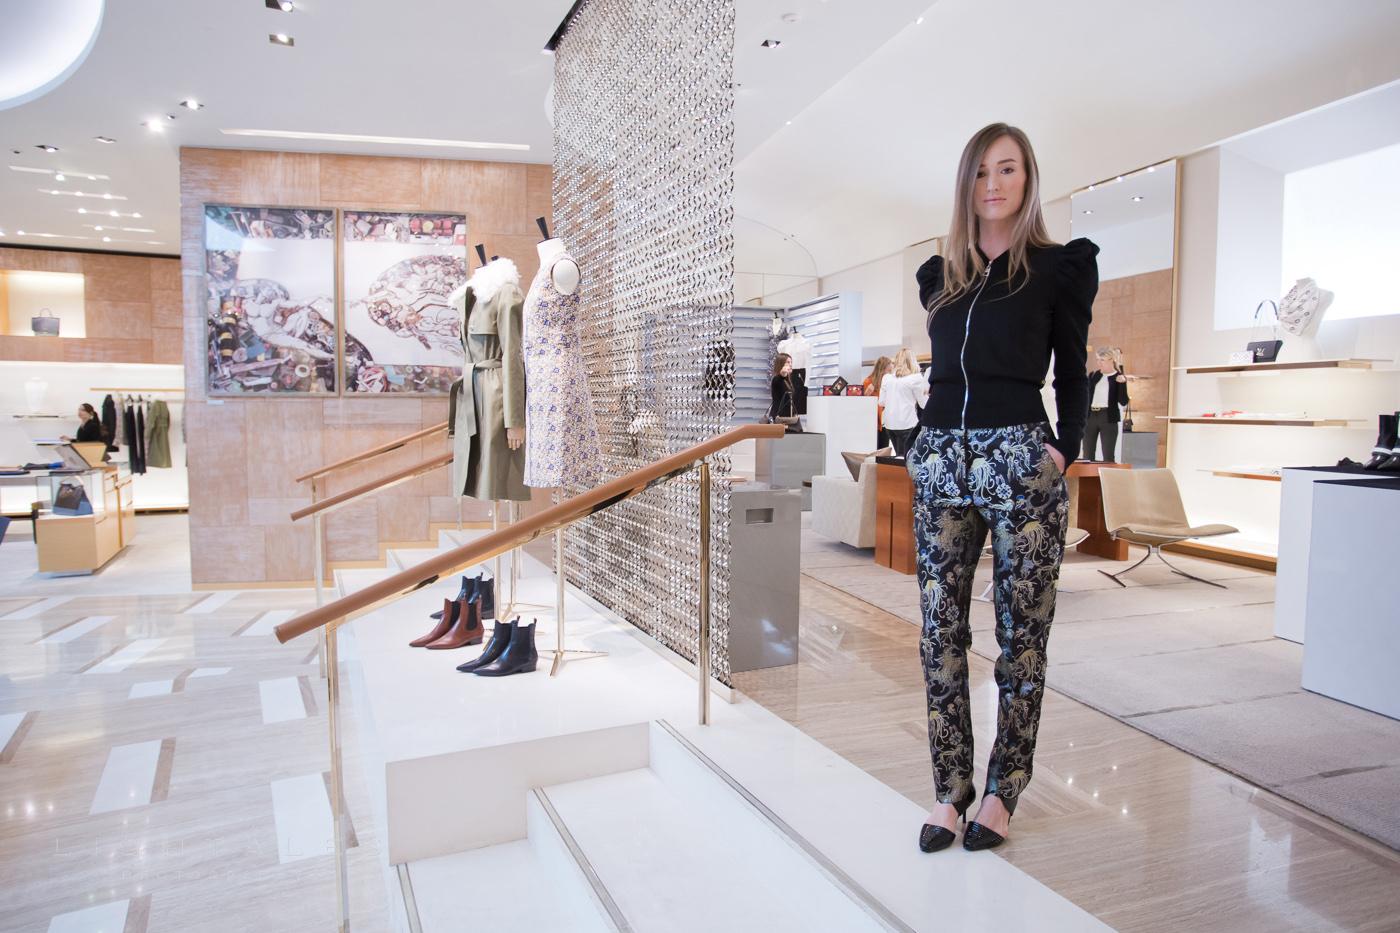 louis-vuitton-flag-shop-roma-preview-fashion-model